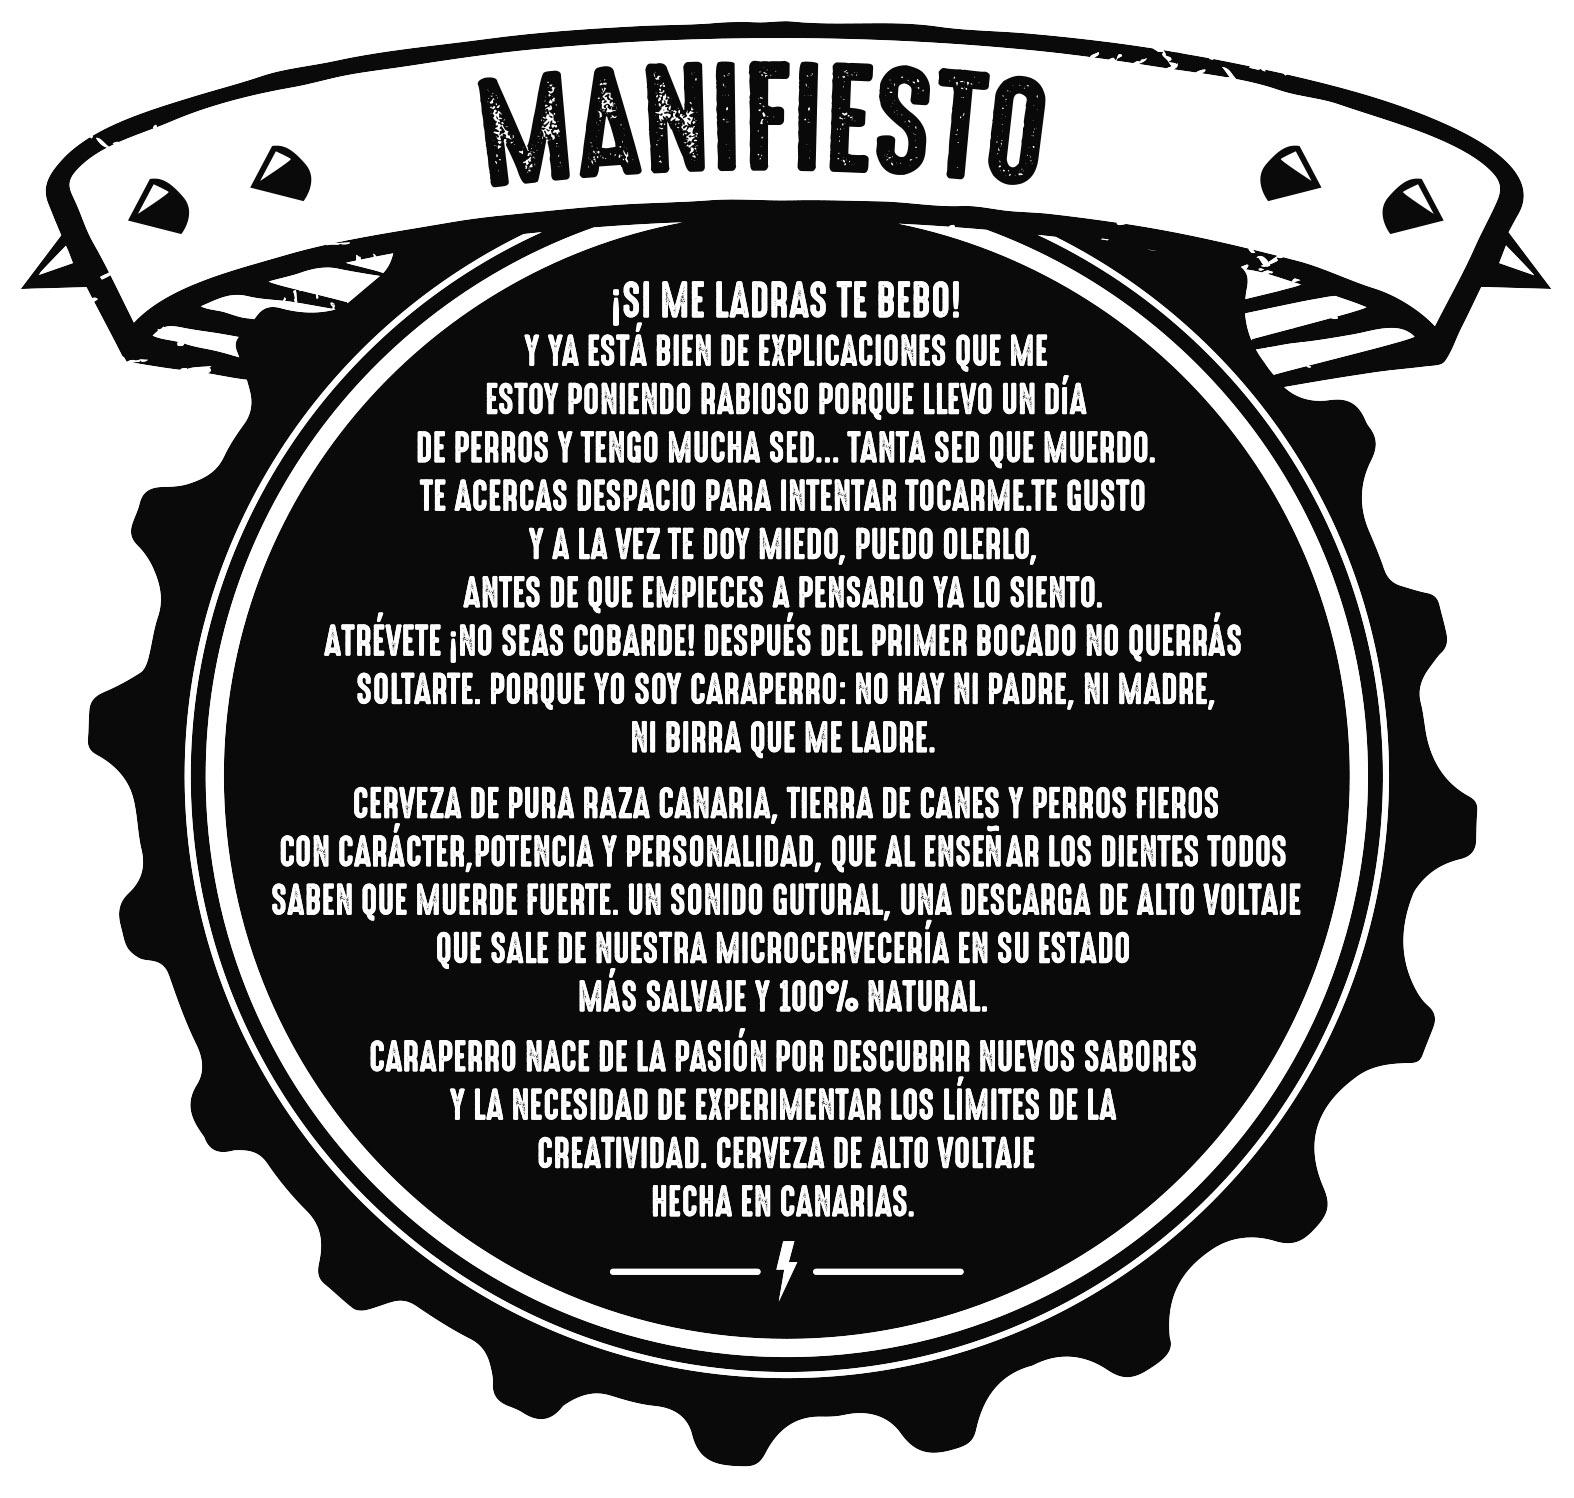 manifesto_caraperro.jpg